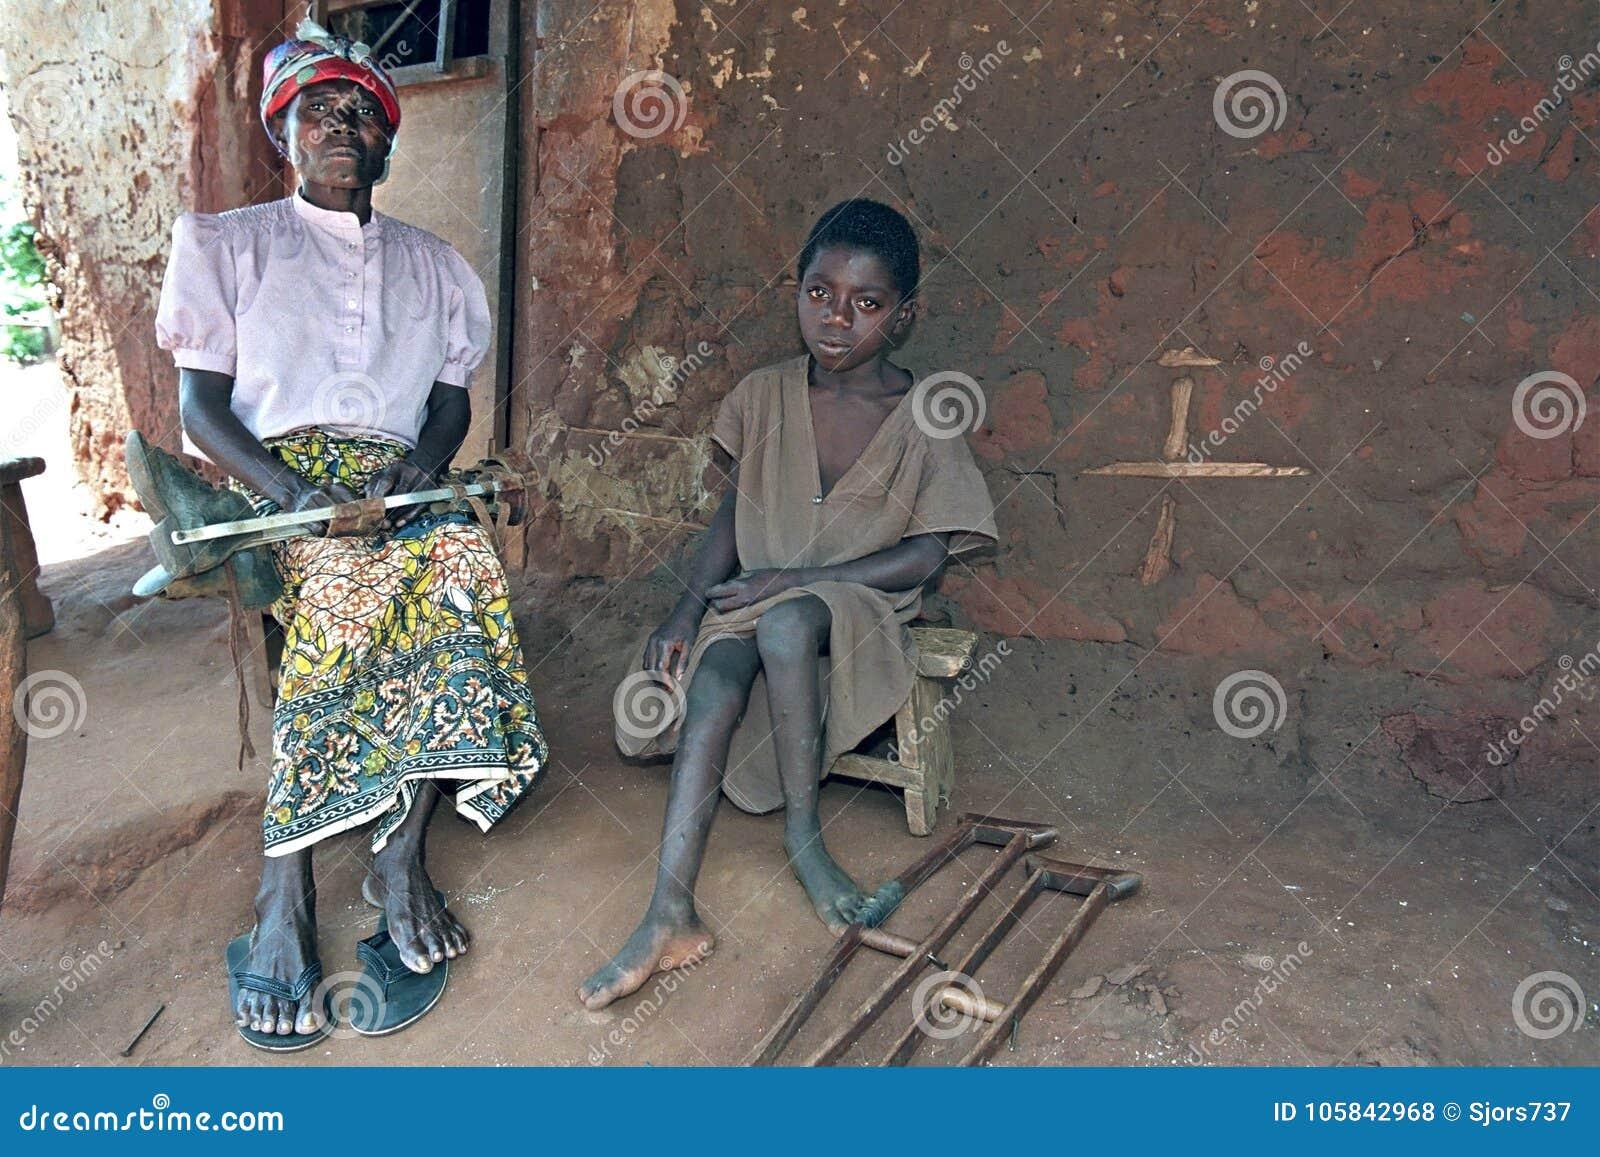 Group portrait of Ghanaian grandma and grandchild